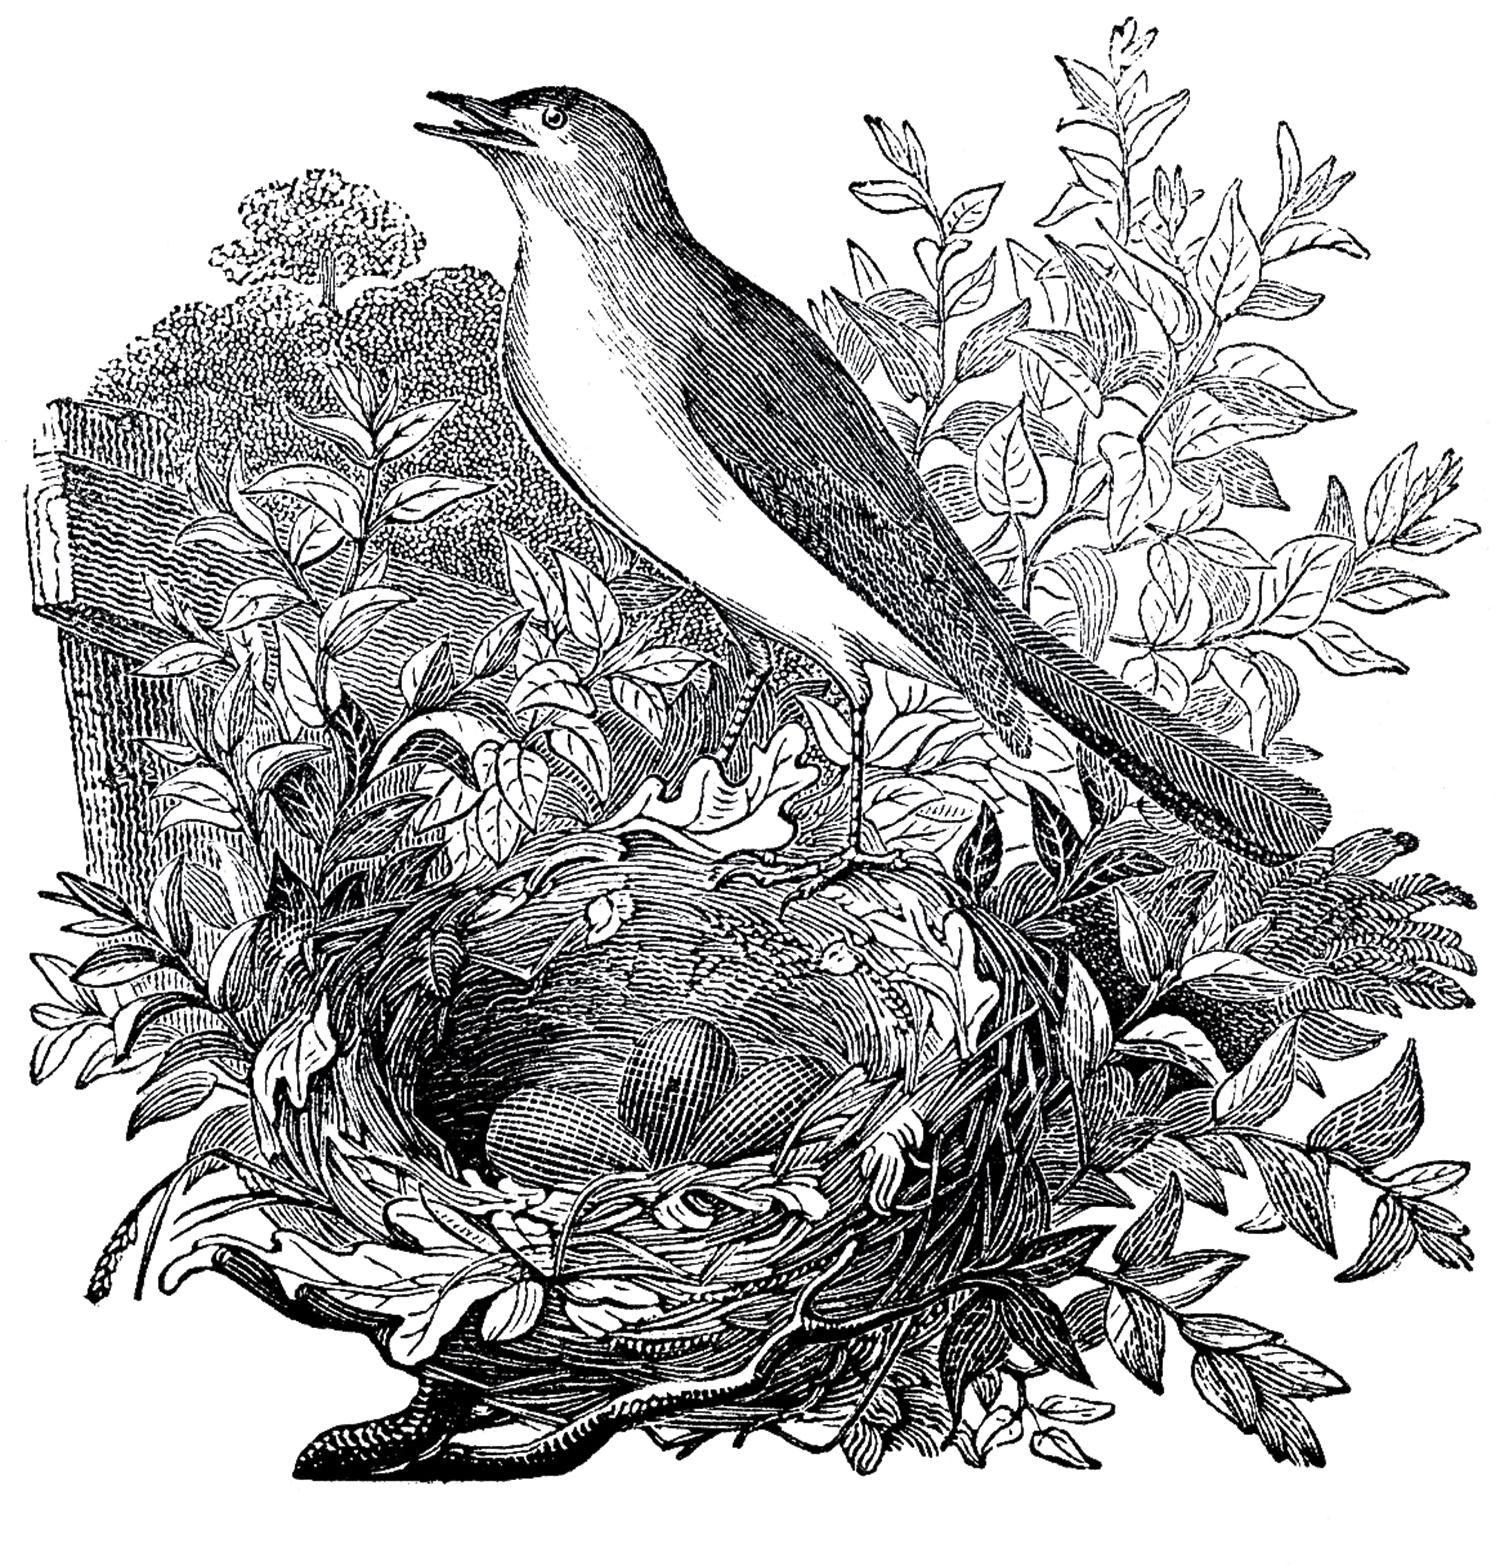 Free Vintage Nightingale Images - The Graphics Fairy